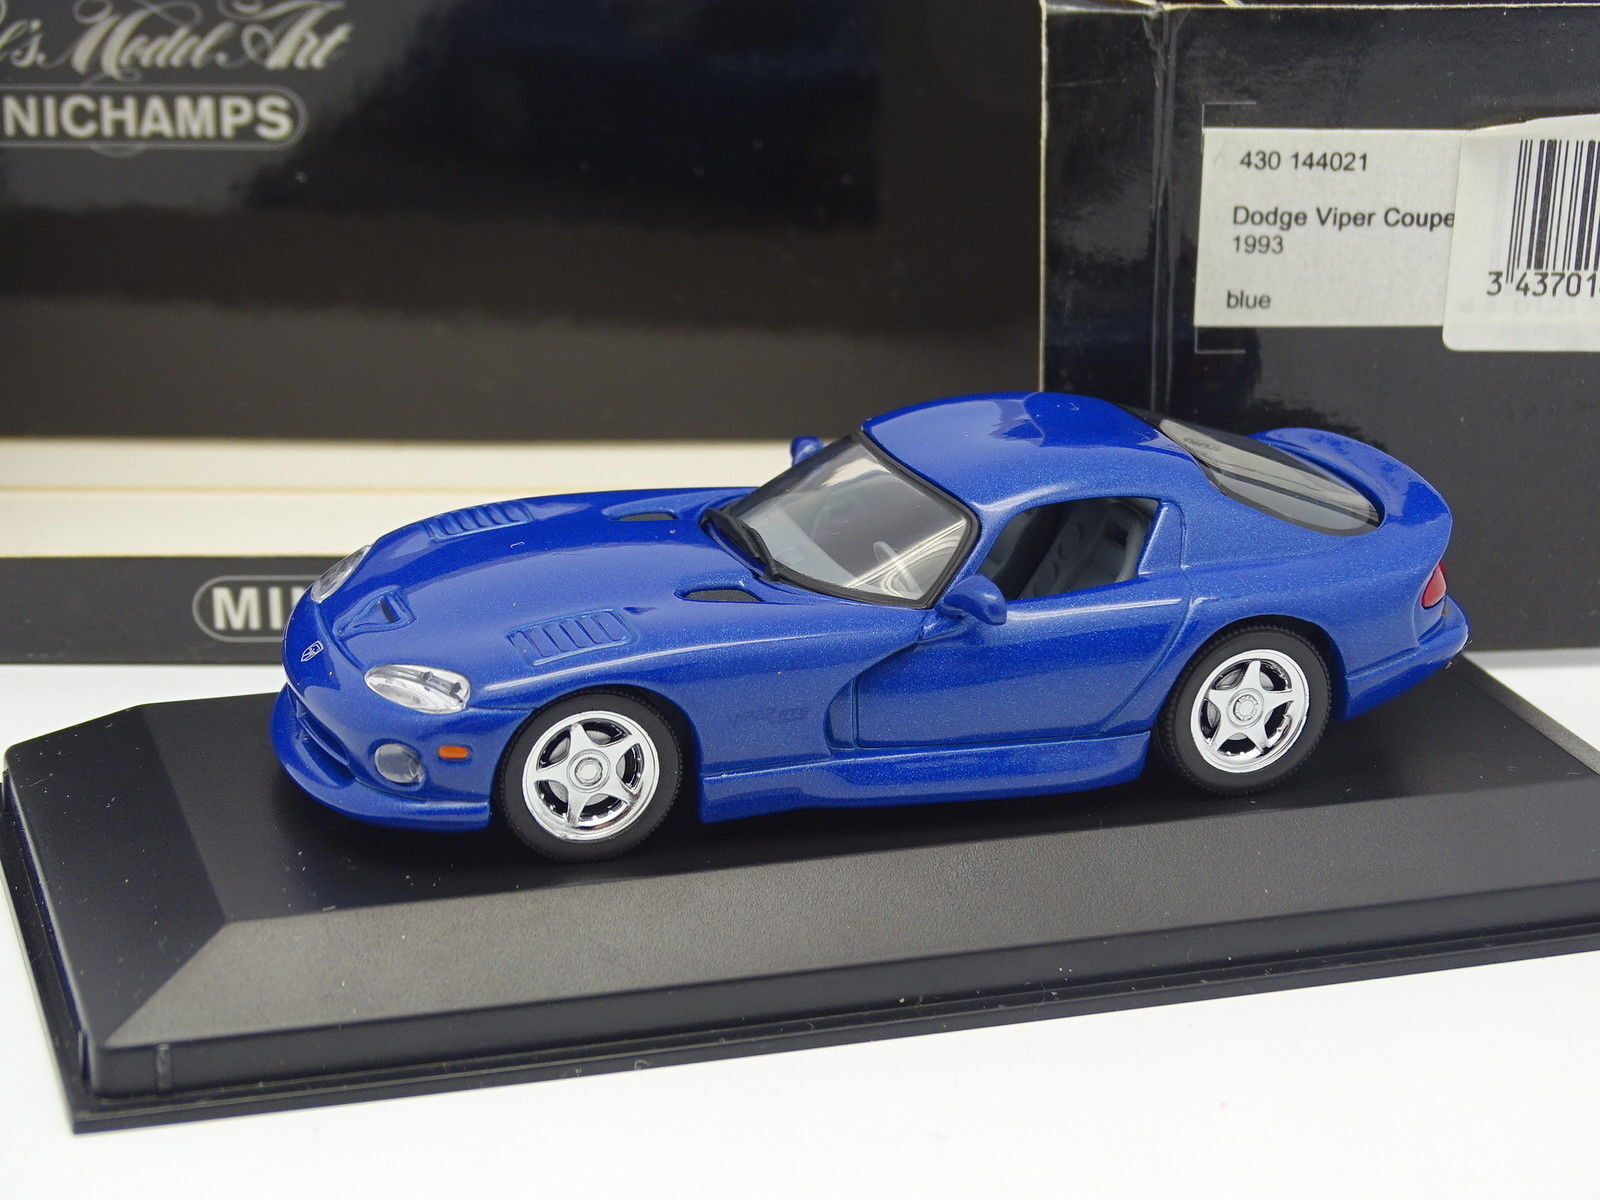 Minichamps 1 43 - Dodge Viper Coupe 1993 bluee